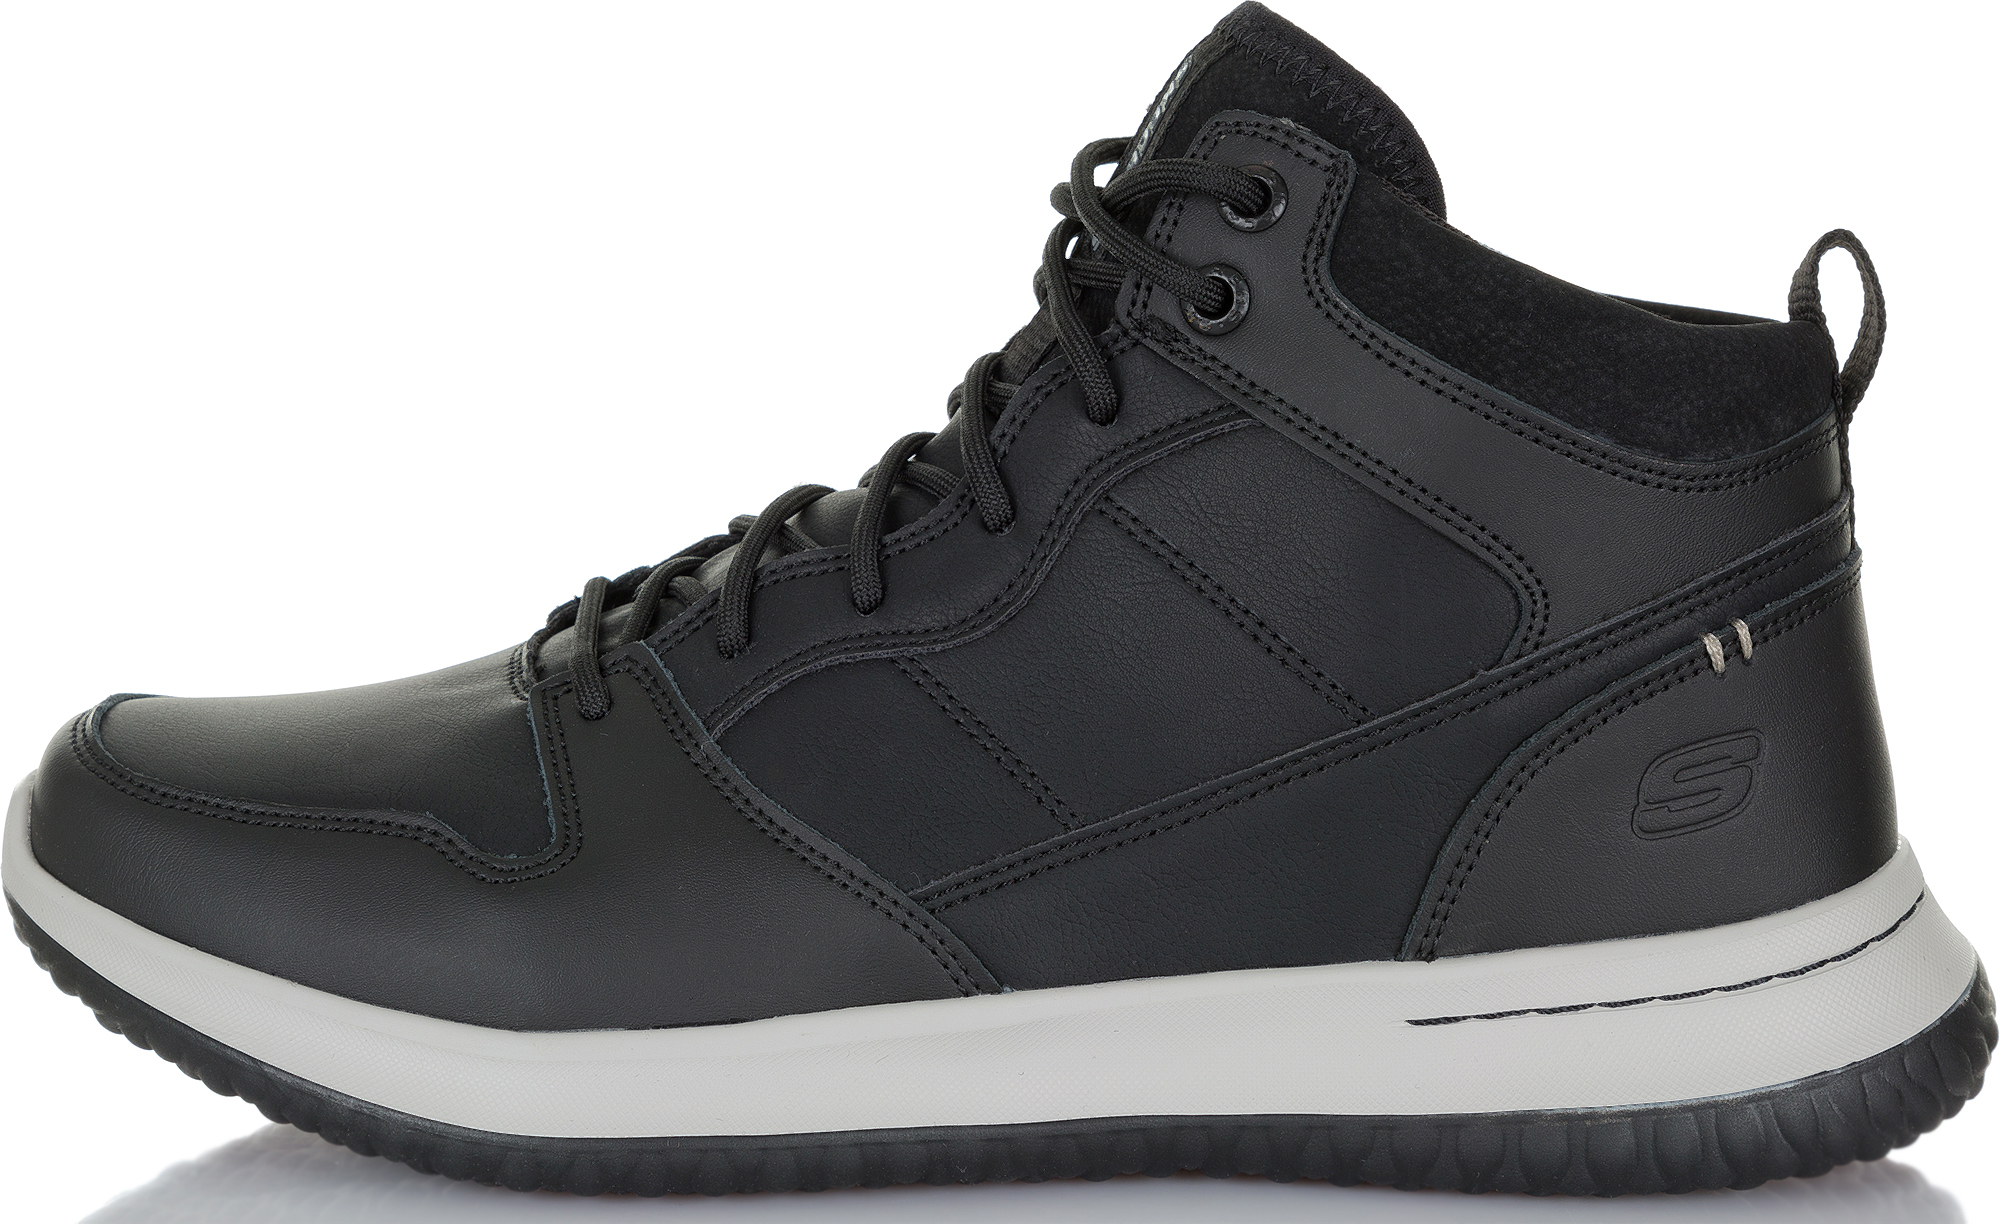 Skechers Ботинки мужские Delson-Ralcon, размер 45